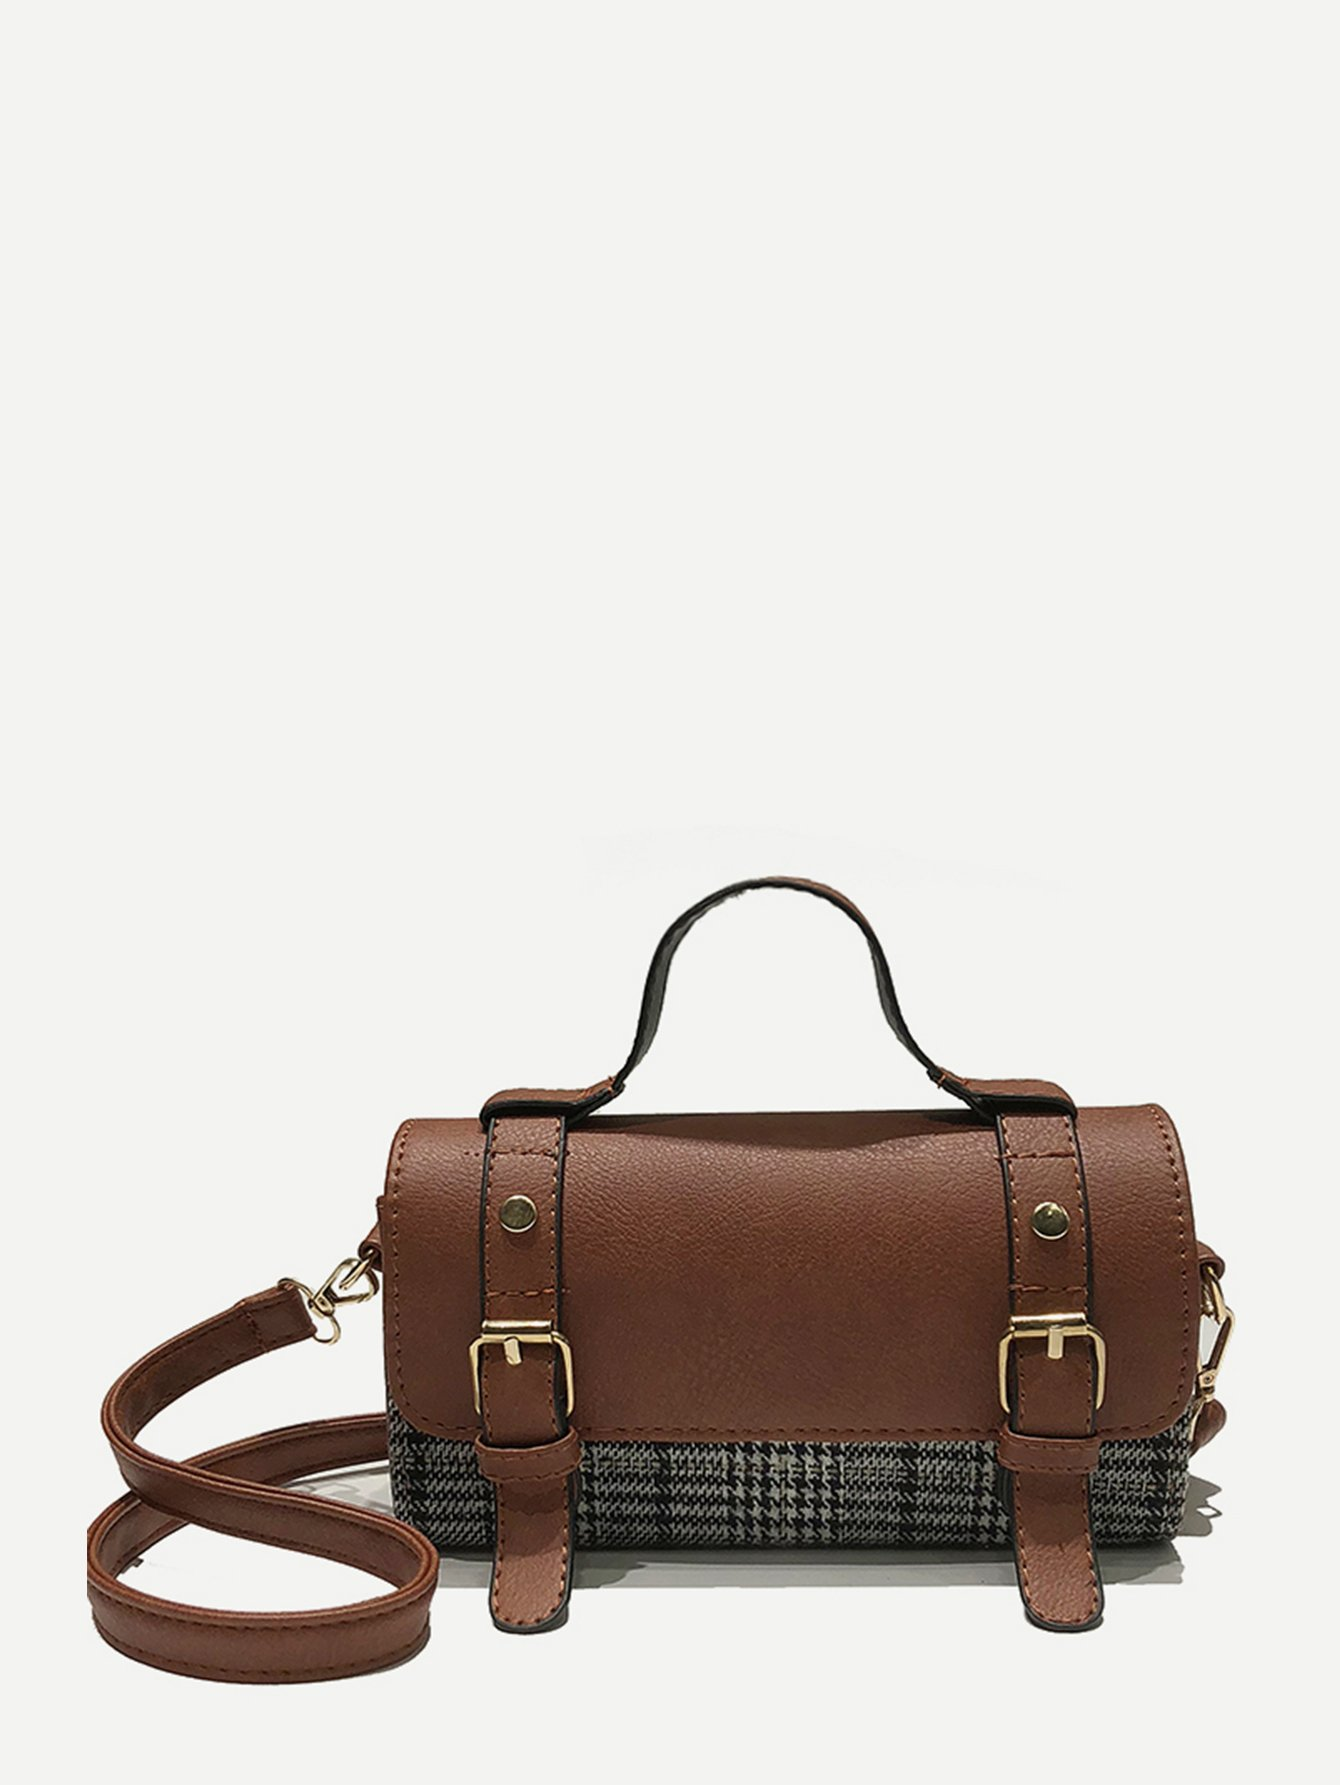 Houndstooth Satchel Bag сумка the cambridge satchel